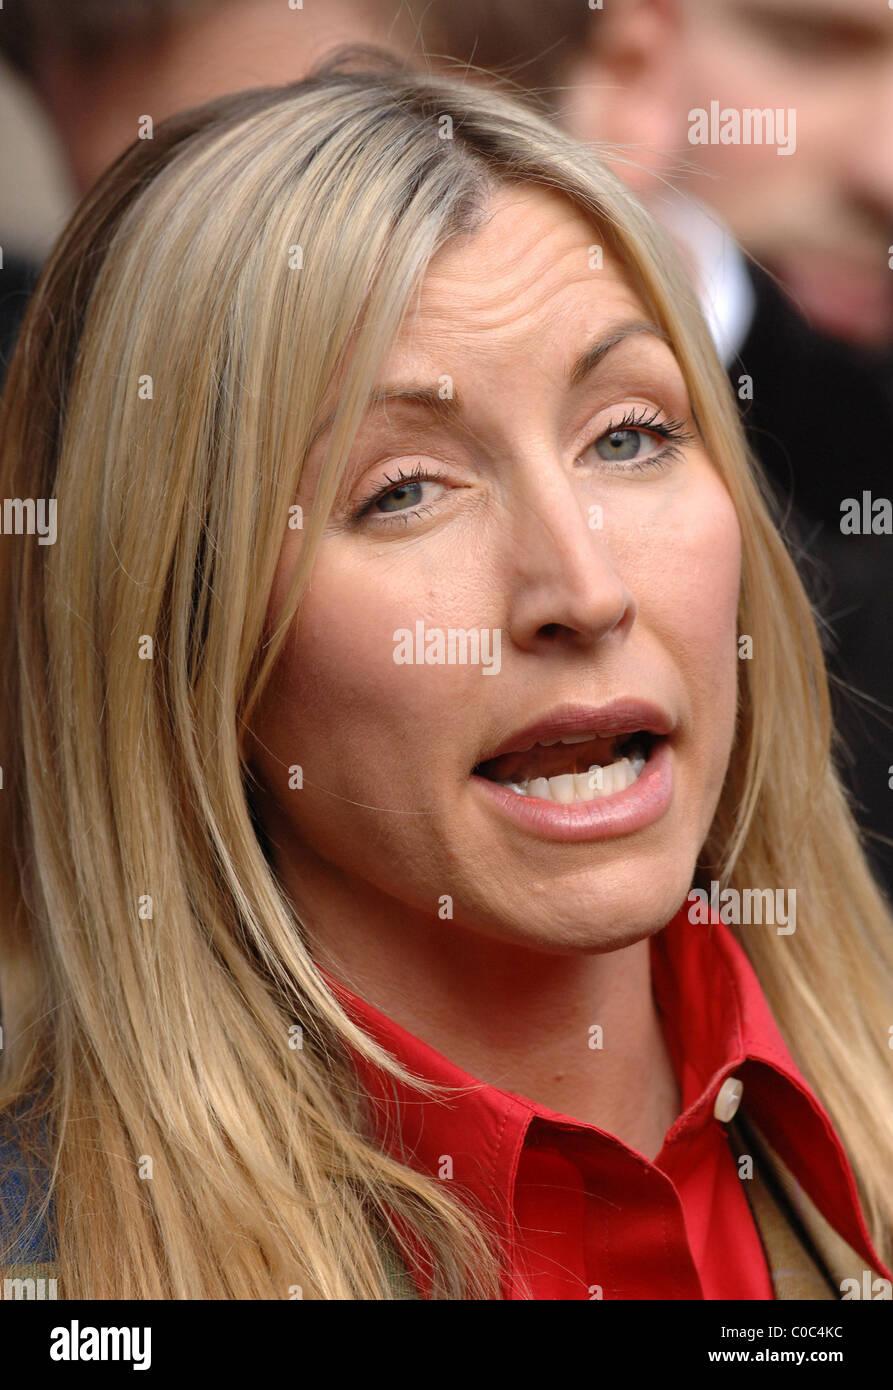 Paul McCartney Has New Locks, Heather Mills Has Old Keys naked (75 photo), Cleavage Celebrites image